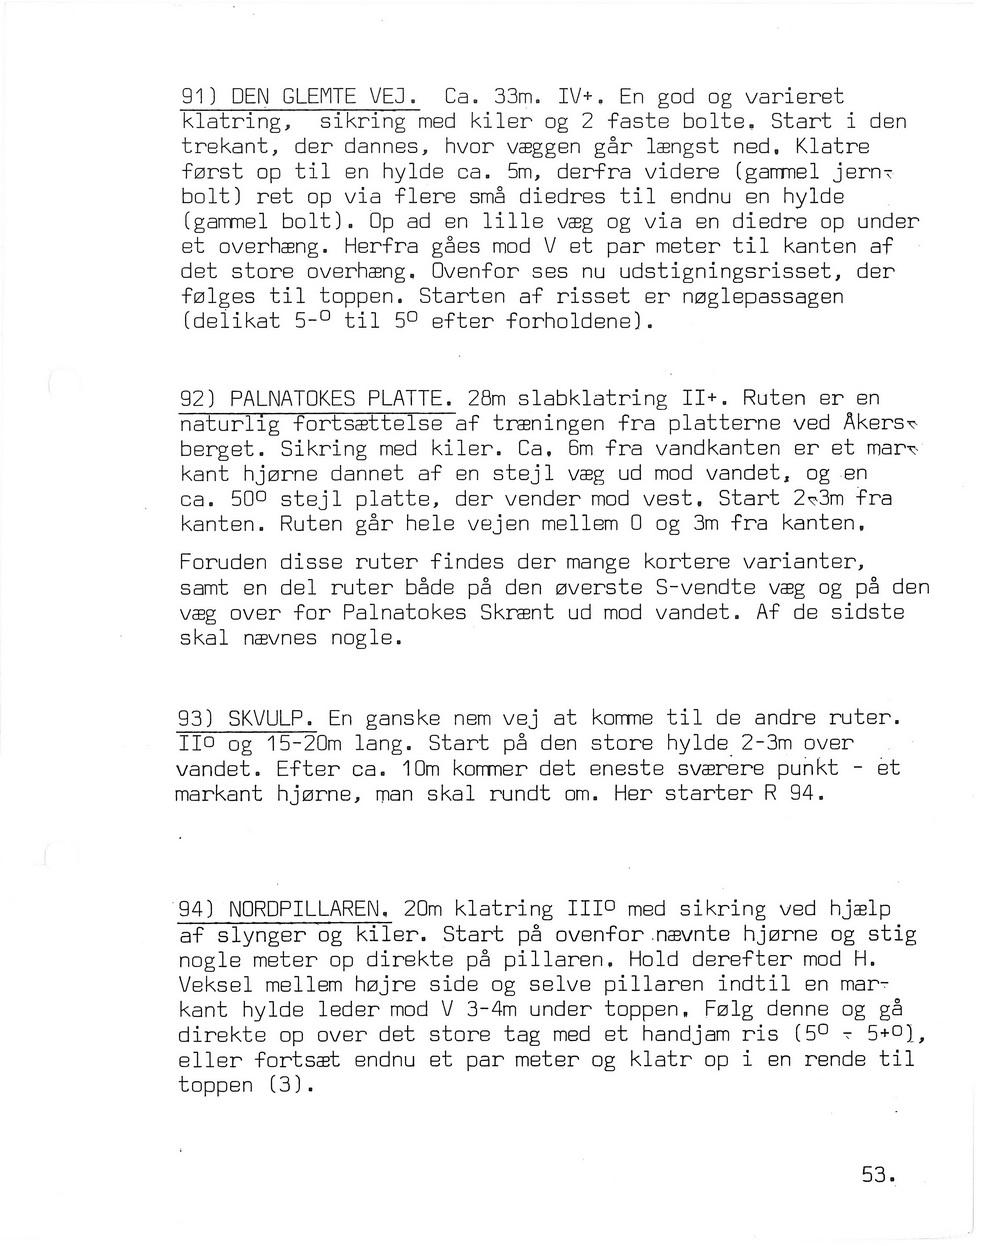 Kullen guide 1972 053.jpg